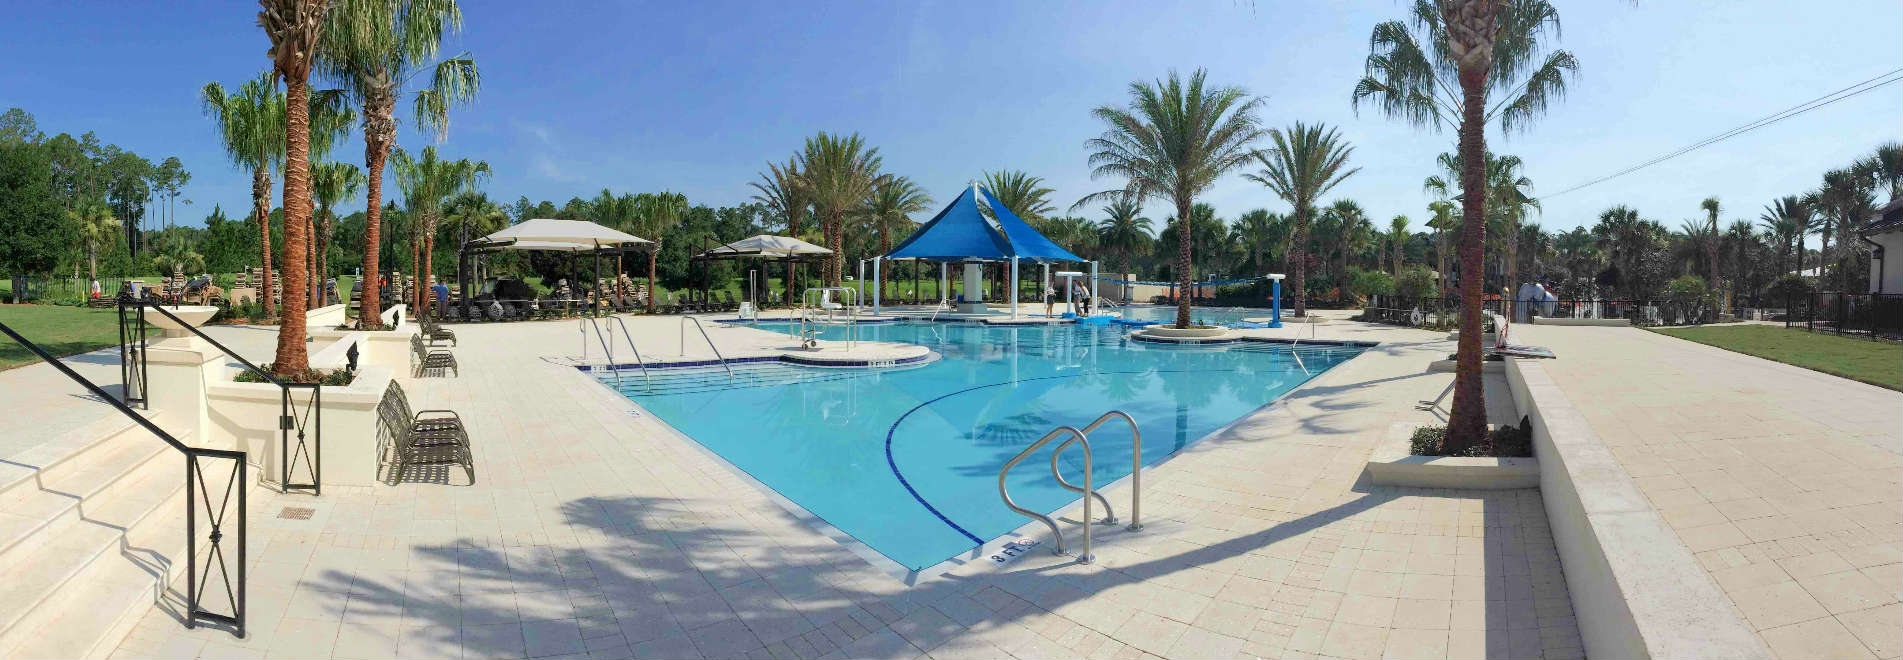 Nocatee Splash Water Park Expansion